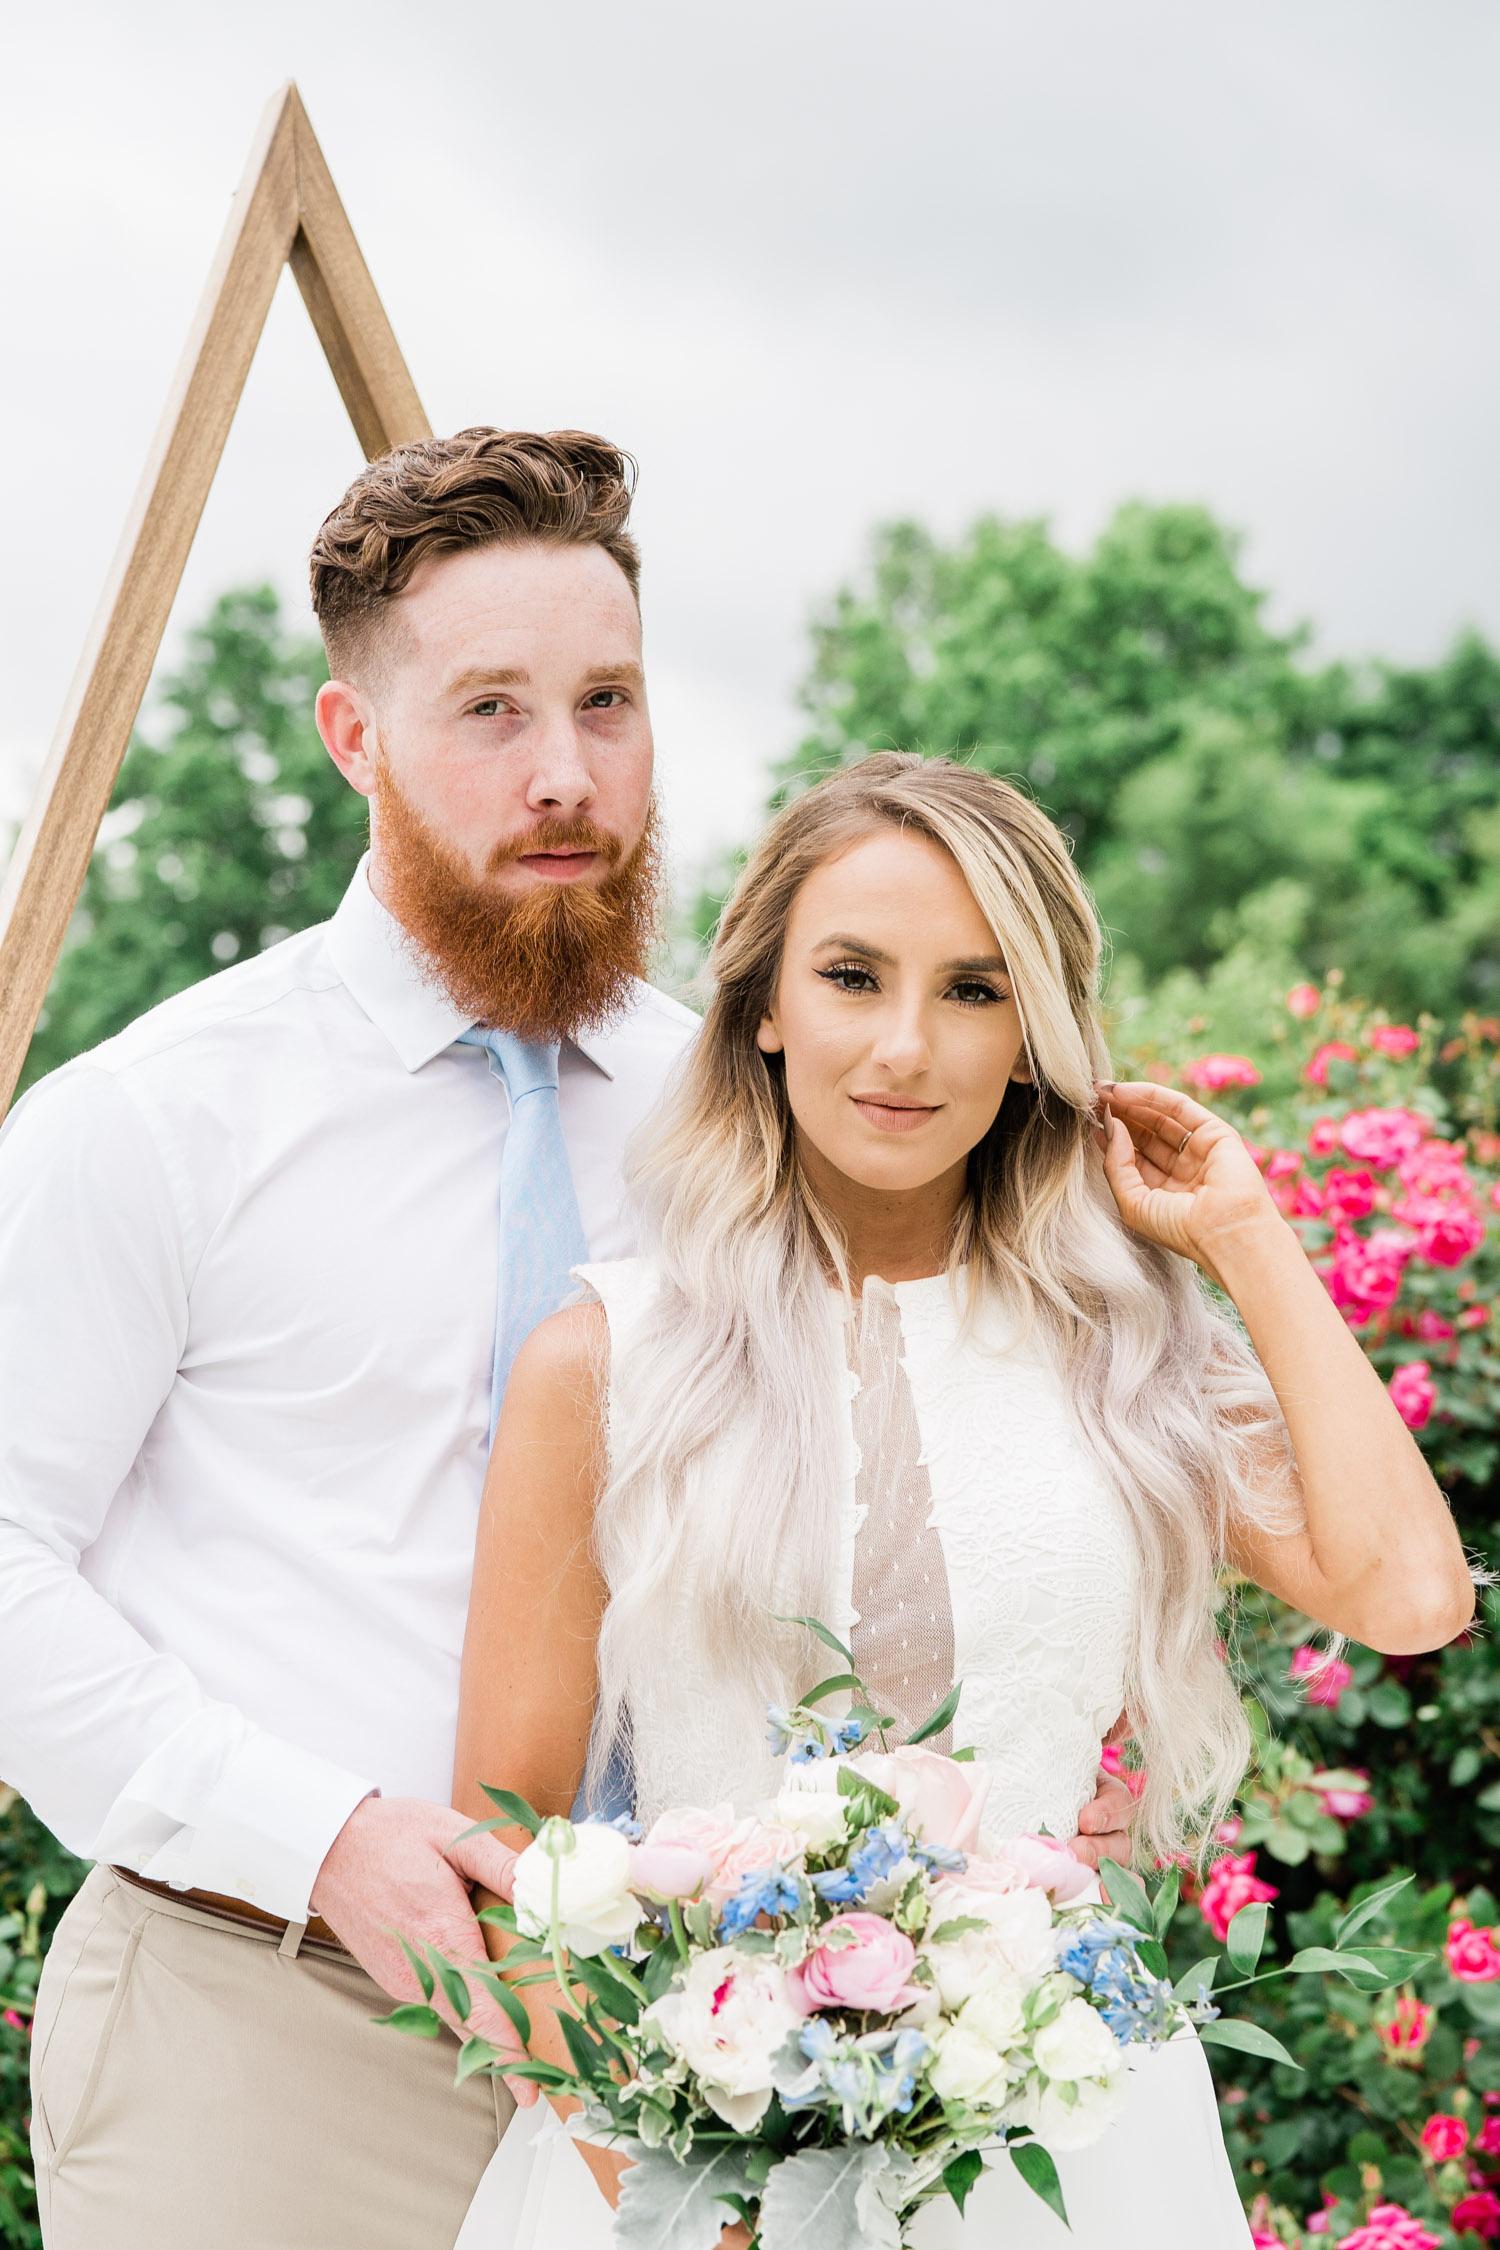 Styled Wedding & Engagement Shoot06444.jpg